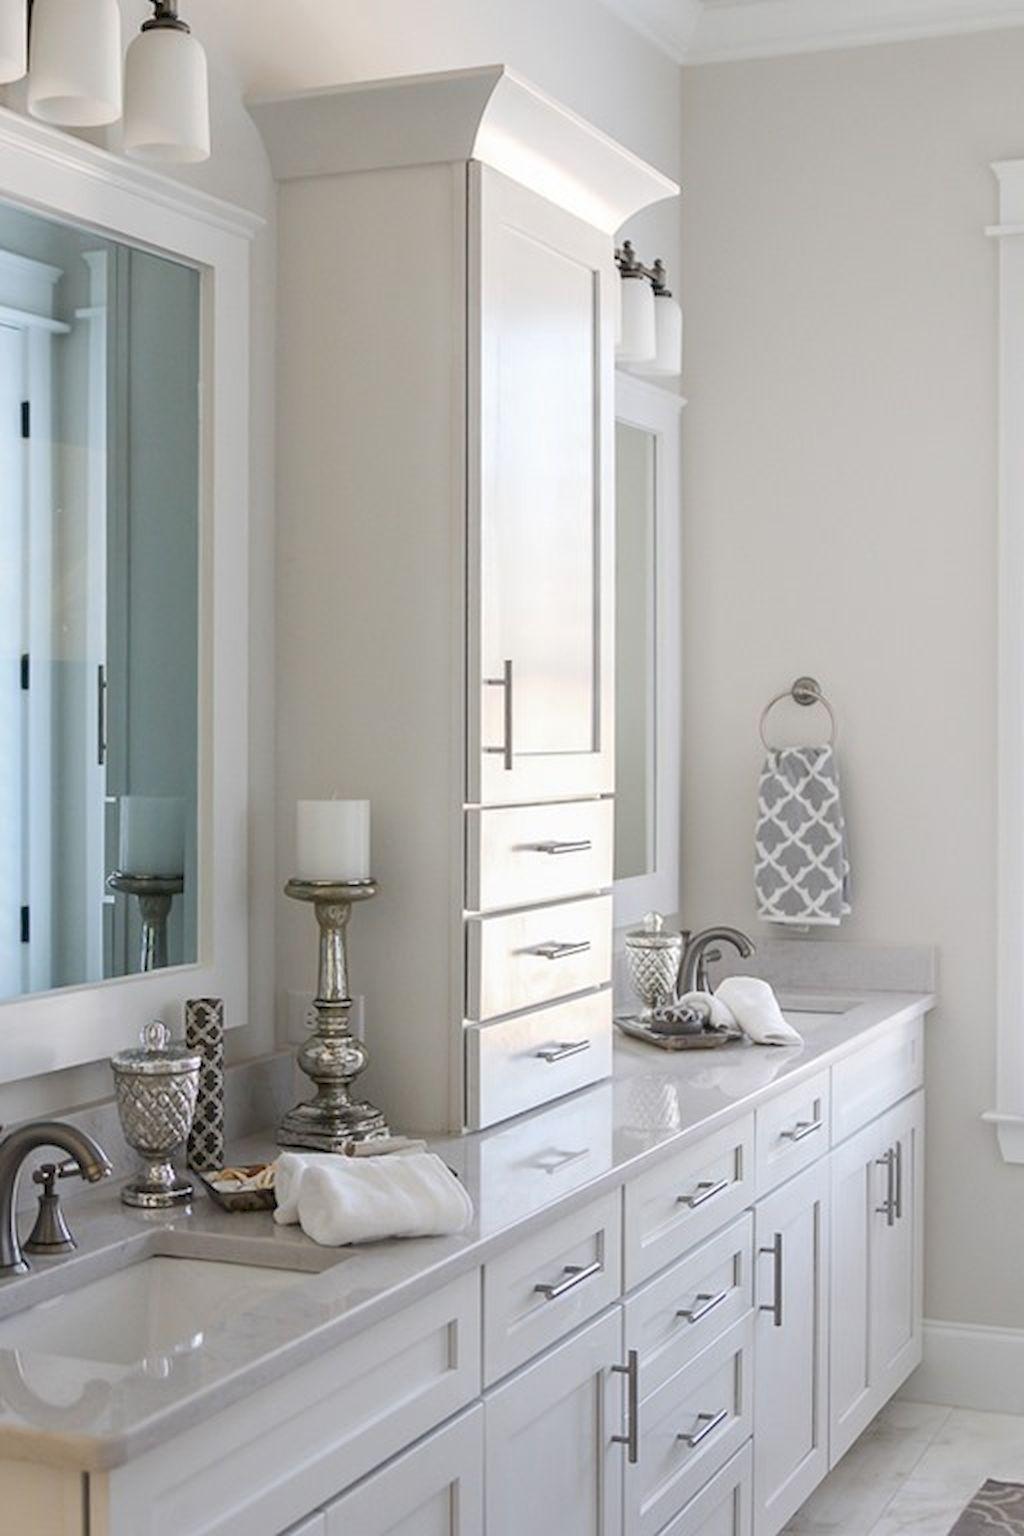 Gorgeous bathroom vanity mirror design ideas (20 | bathroom cabinet ...